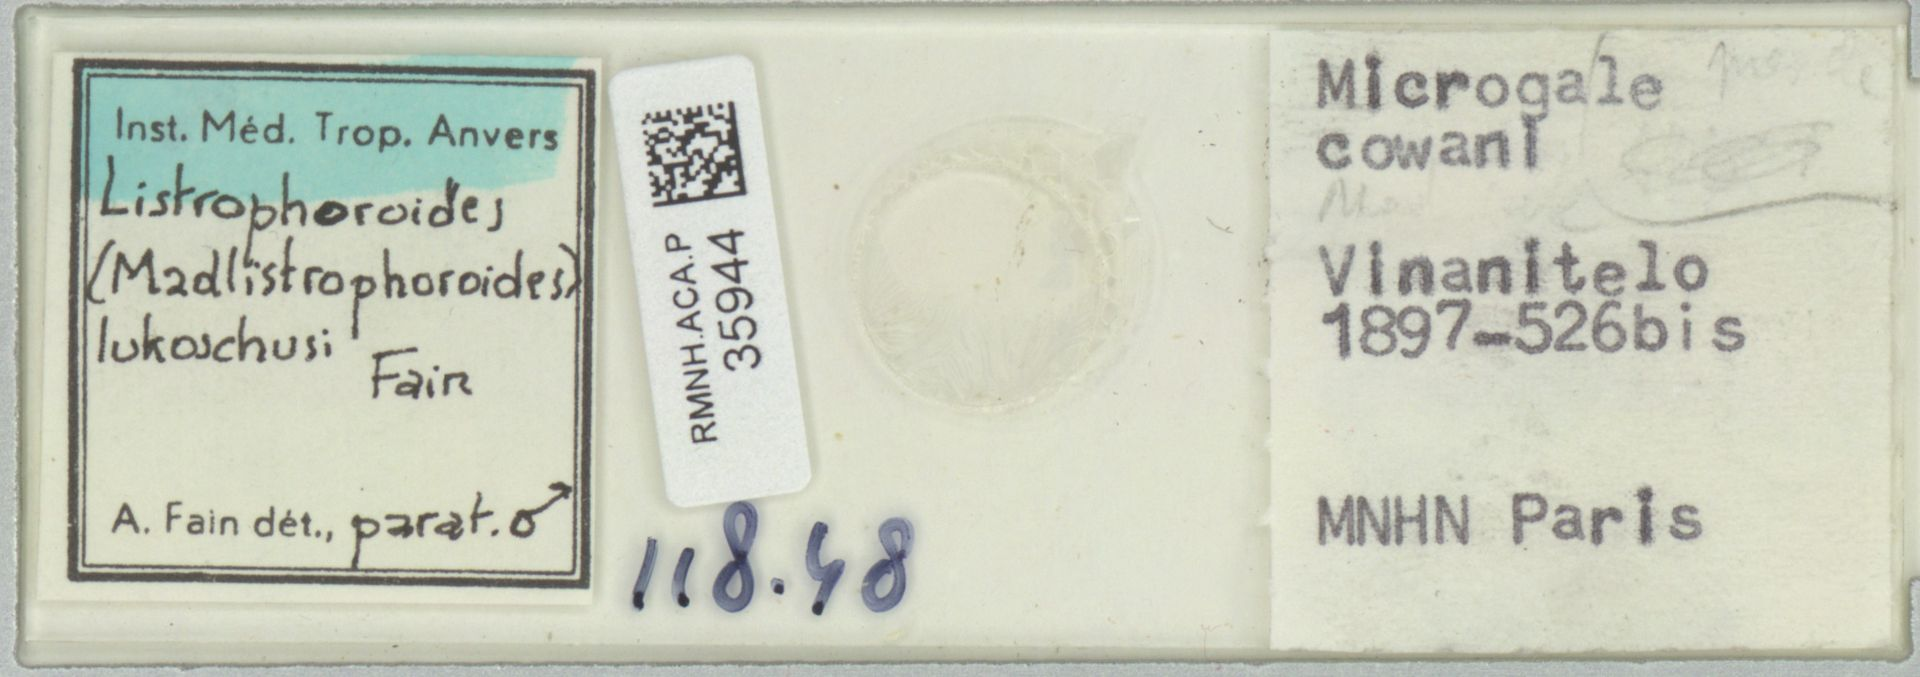 RMNH.ACA.P.35944 | Listrophoroides (Madlistrophoroides) lukoschusi Fain